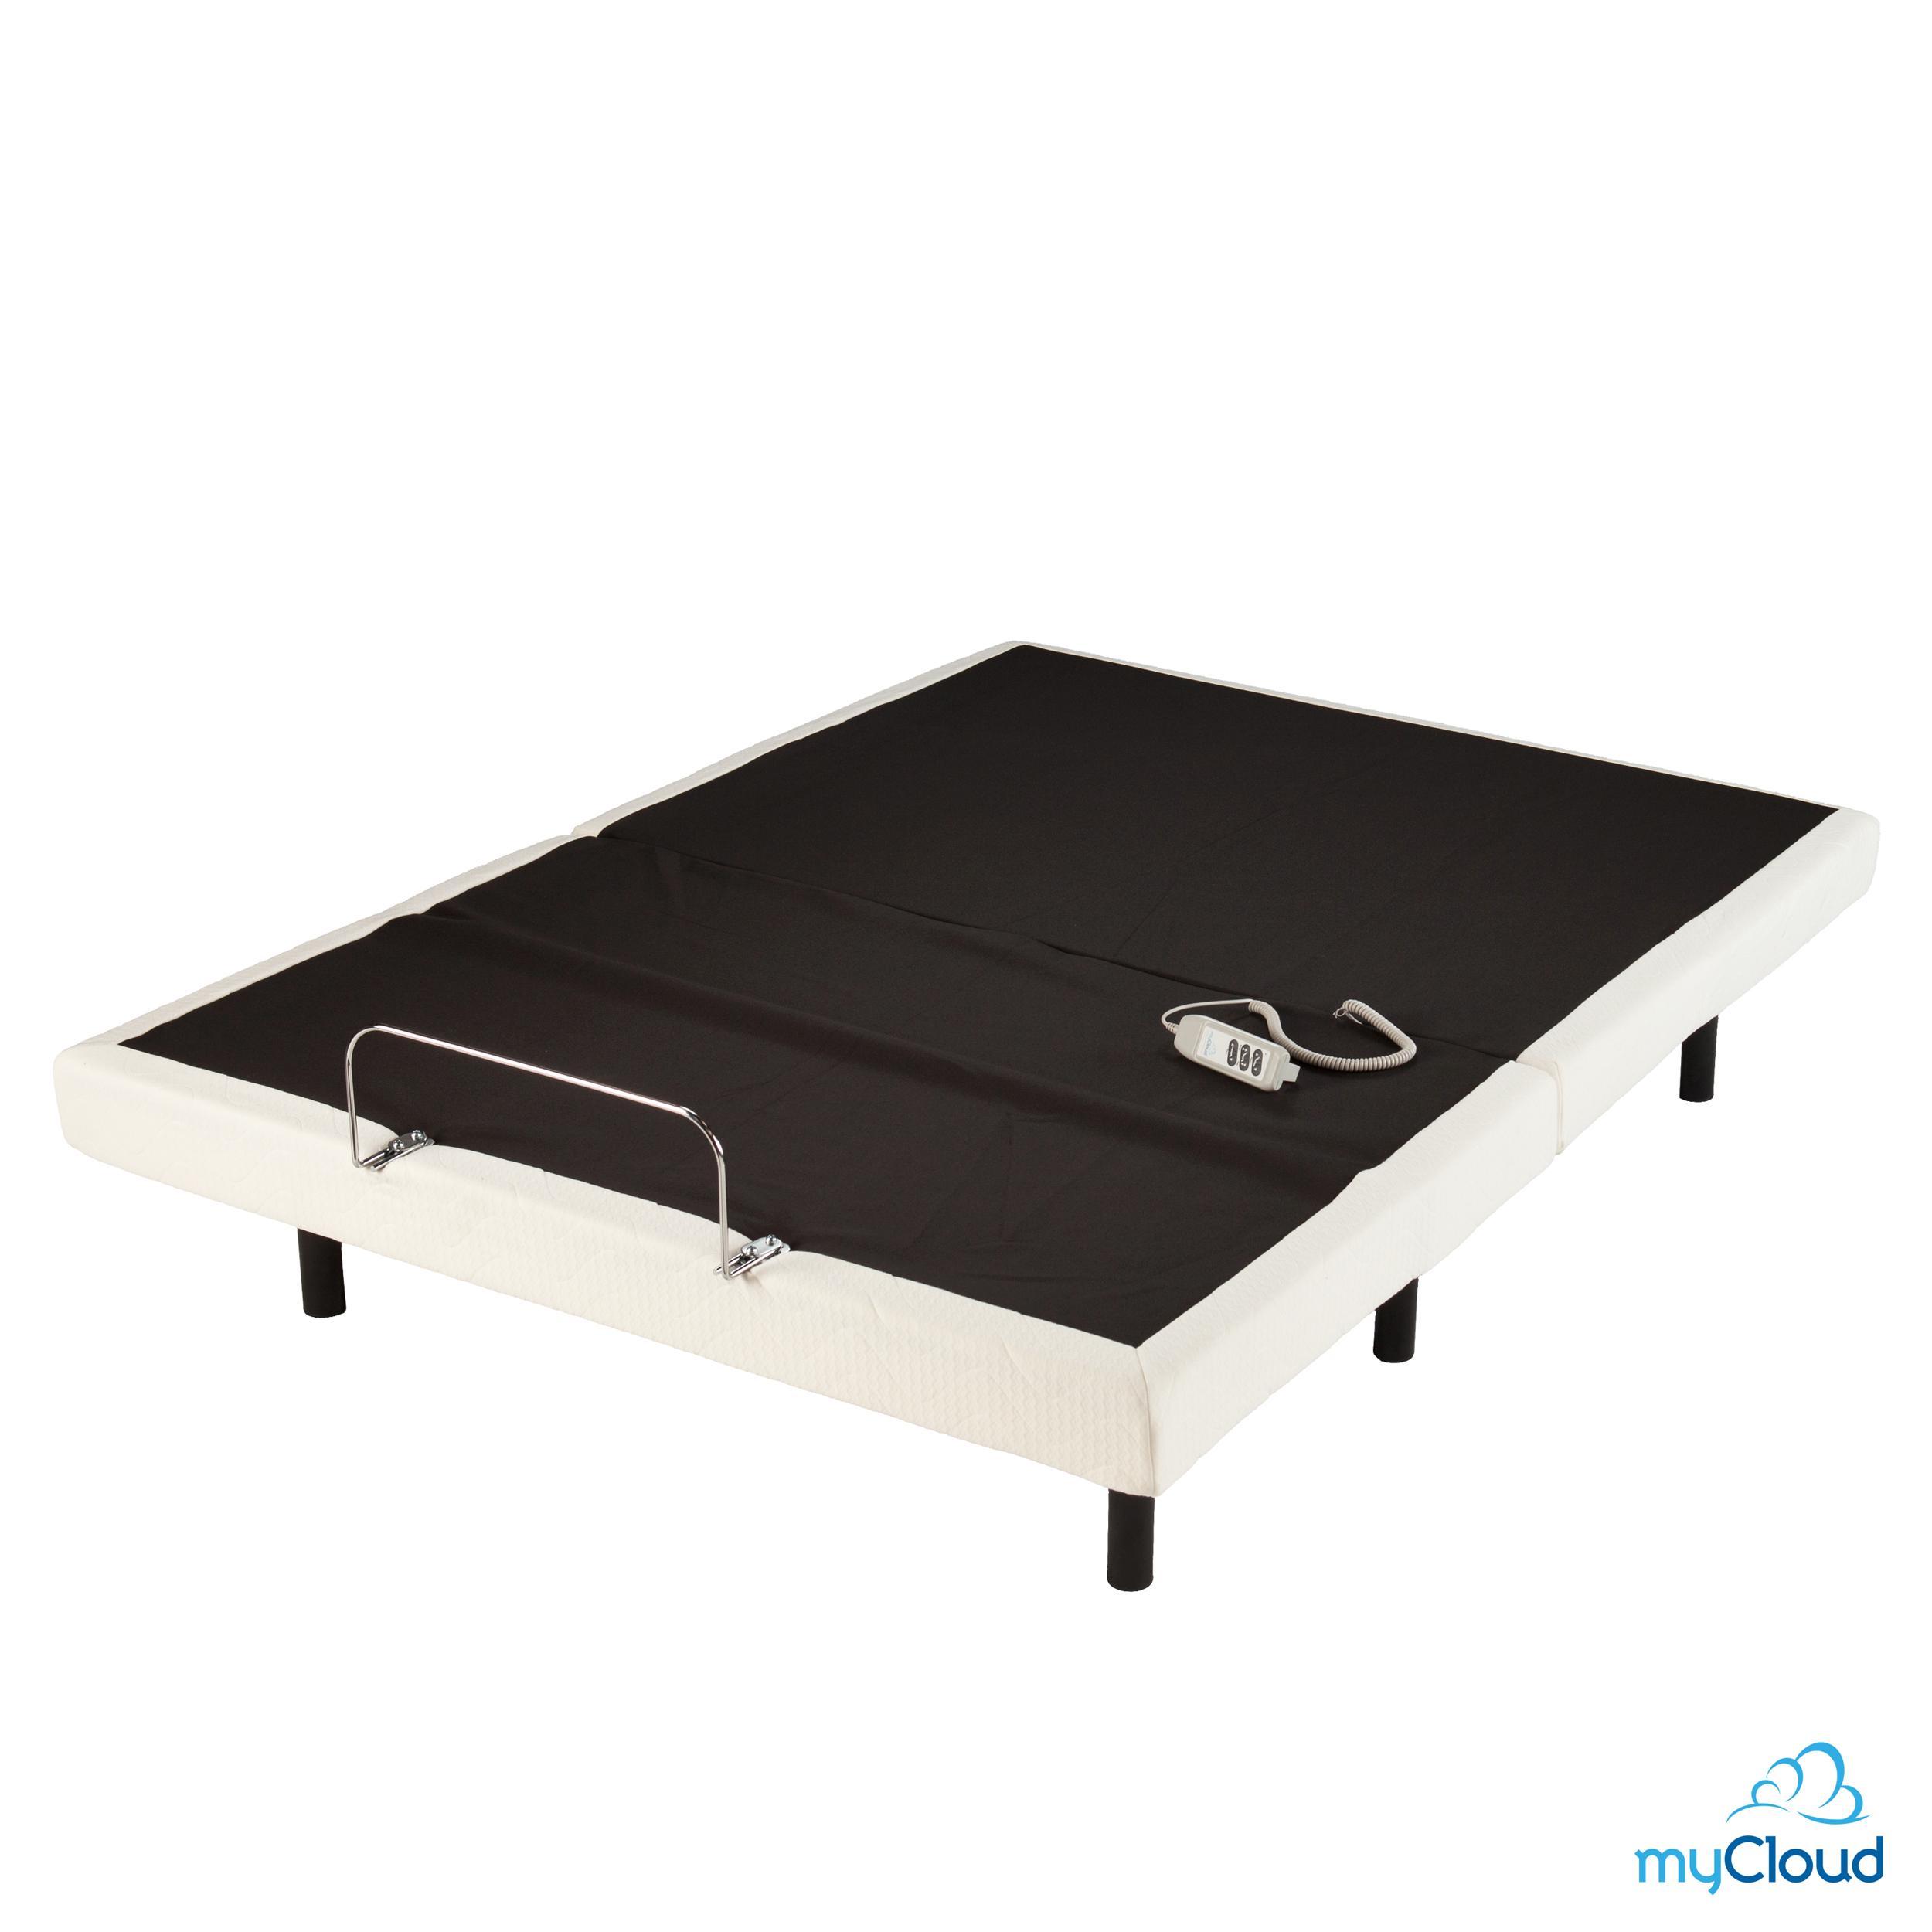 Adjustable Beds Manufacturers : View larger